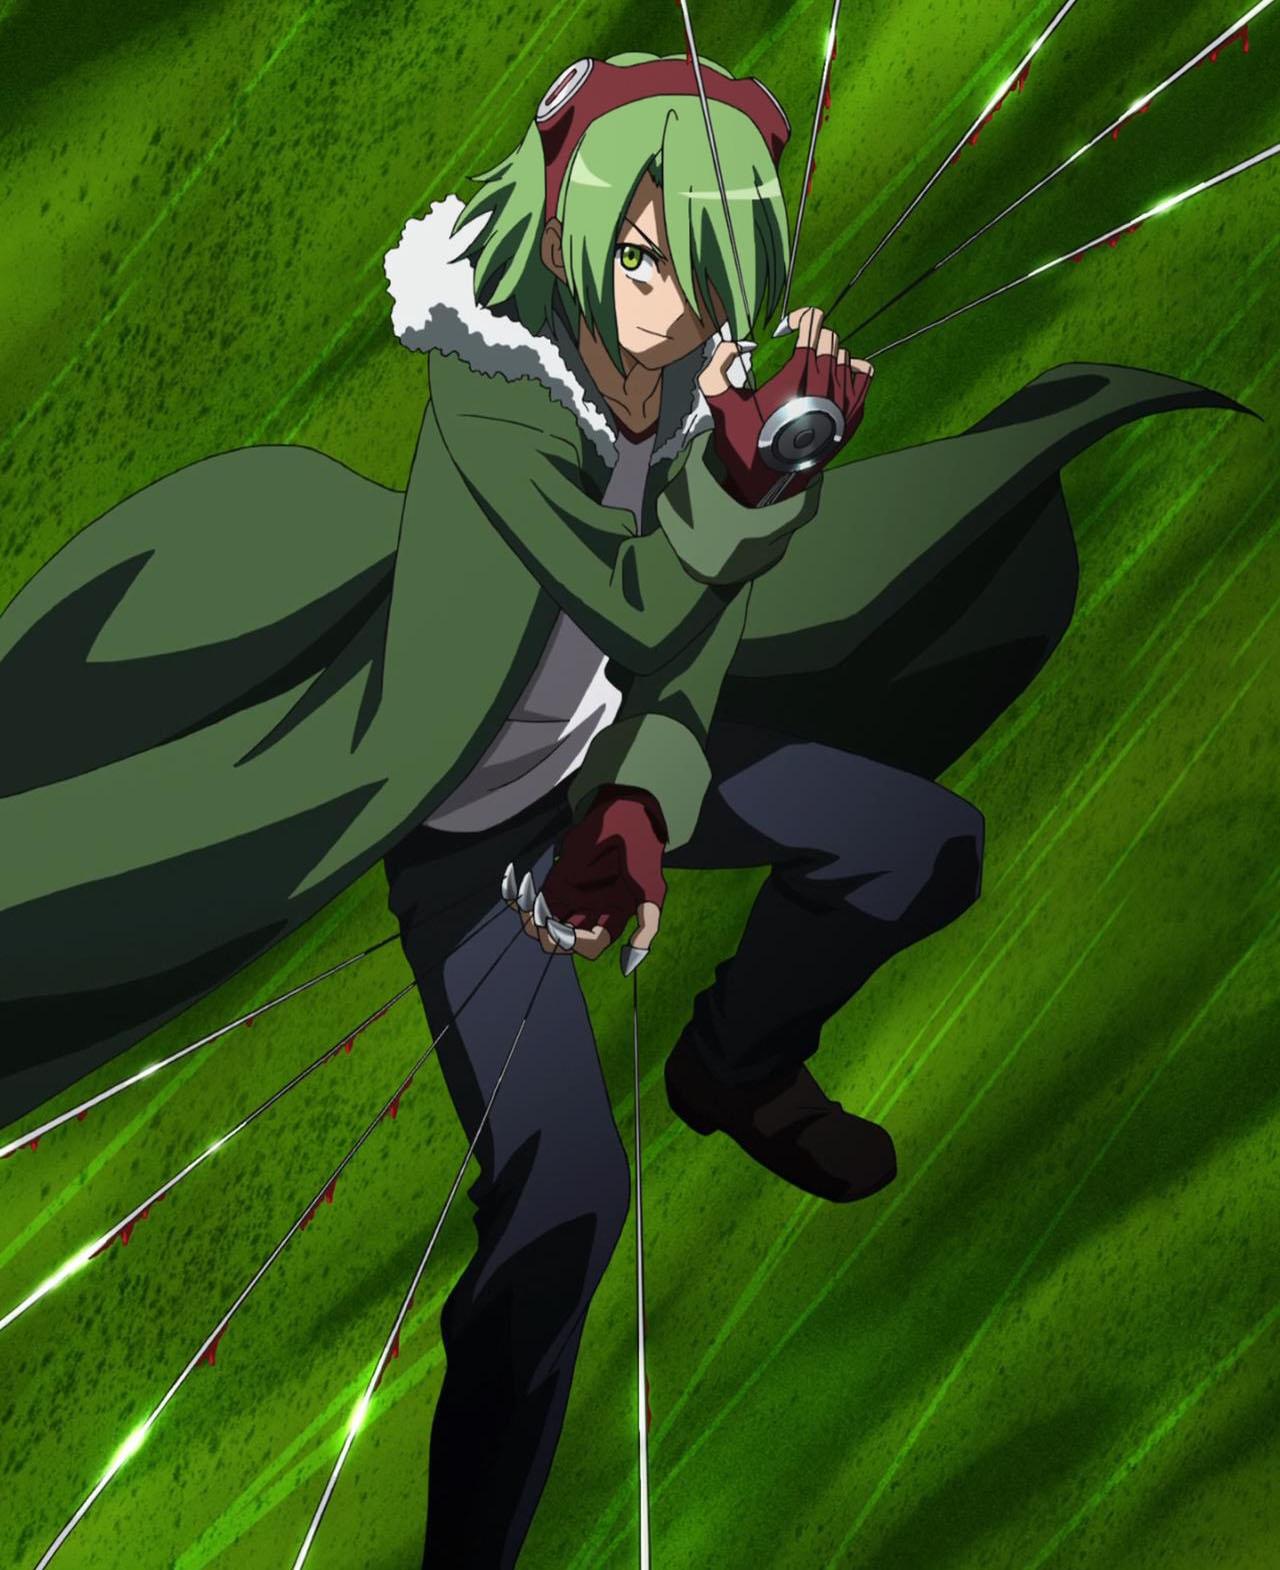 Anime Characters Fighting : Attack on titan custom skins view topic akame ga kill